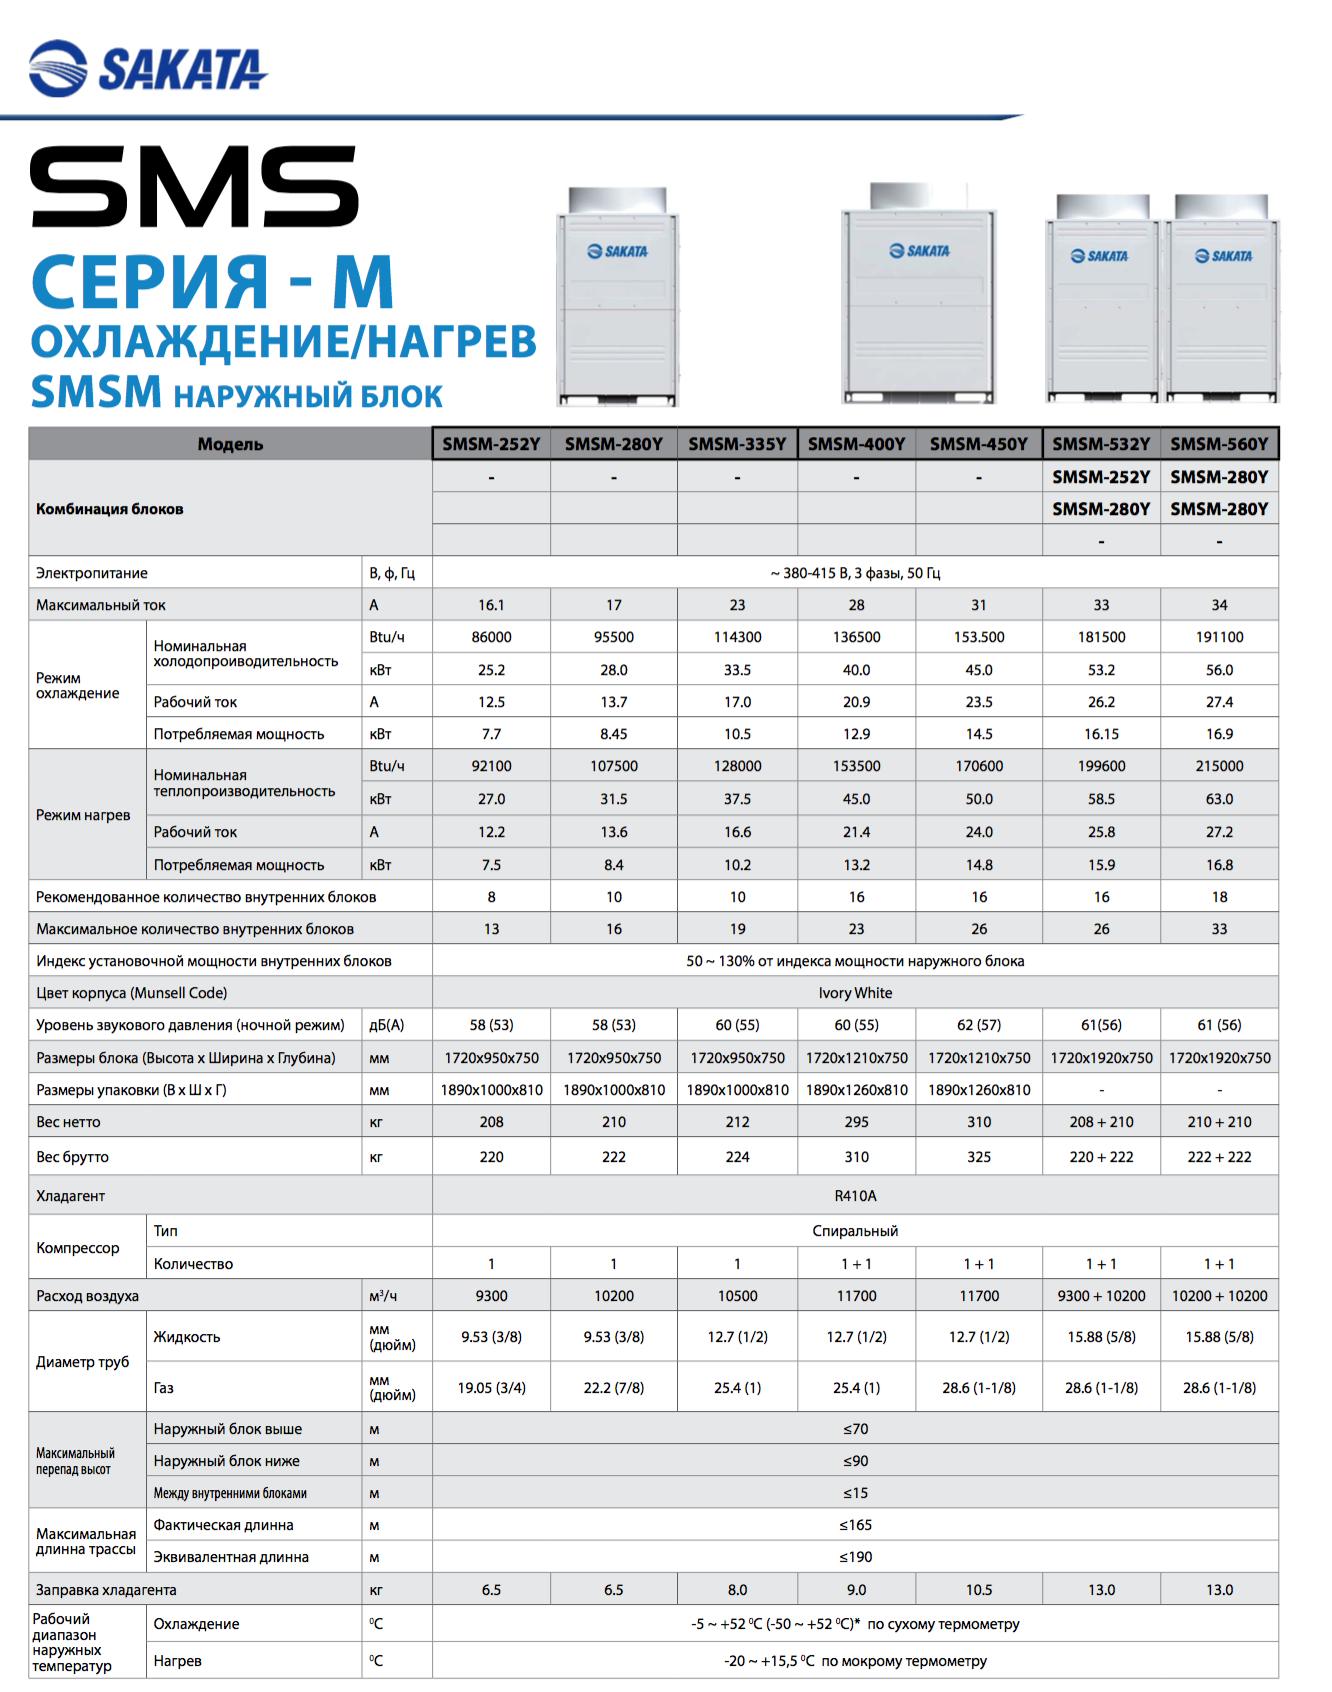 VRF_SMS_серия_M_1.png